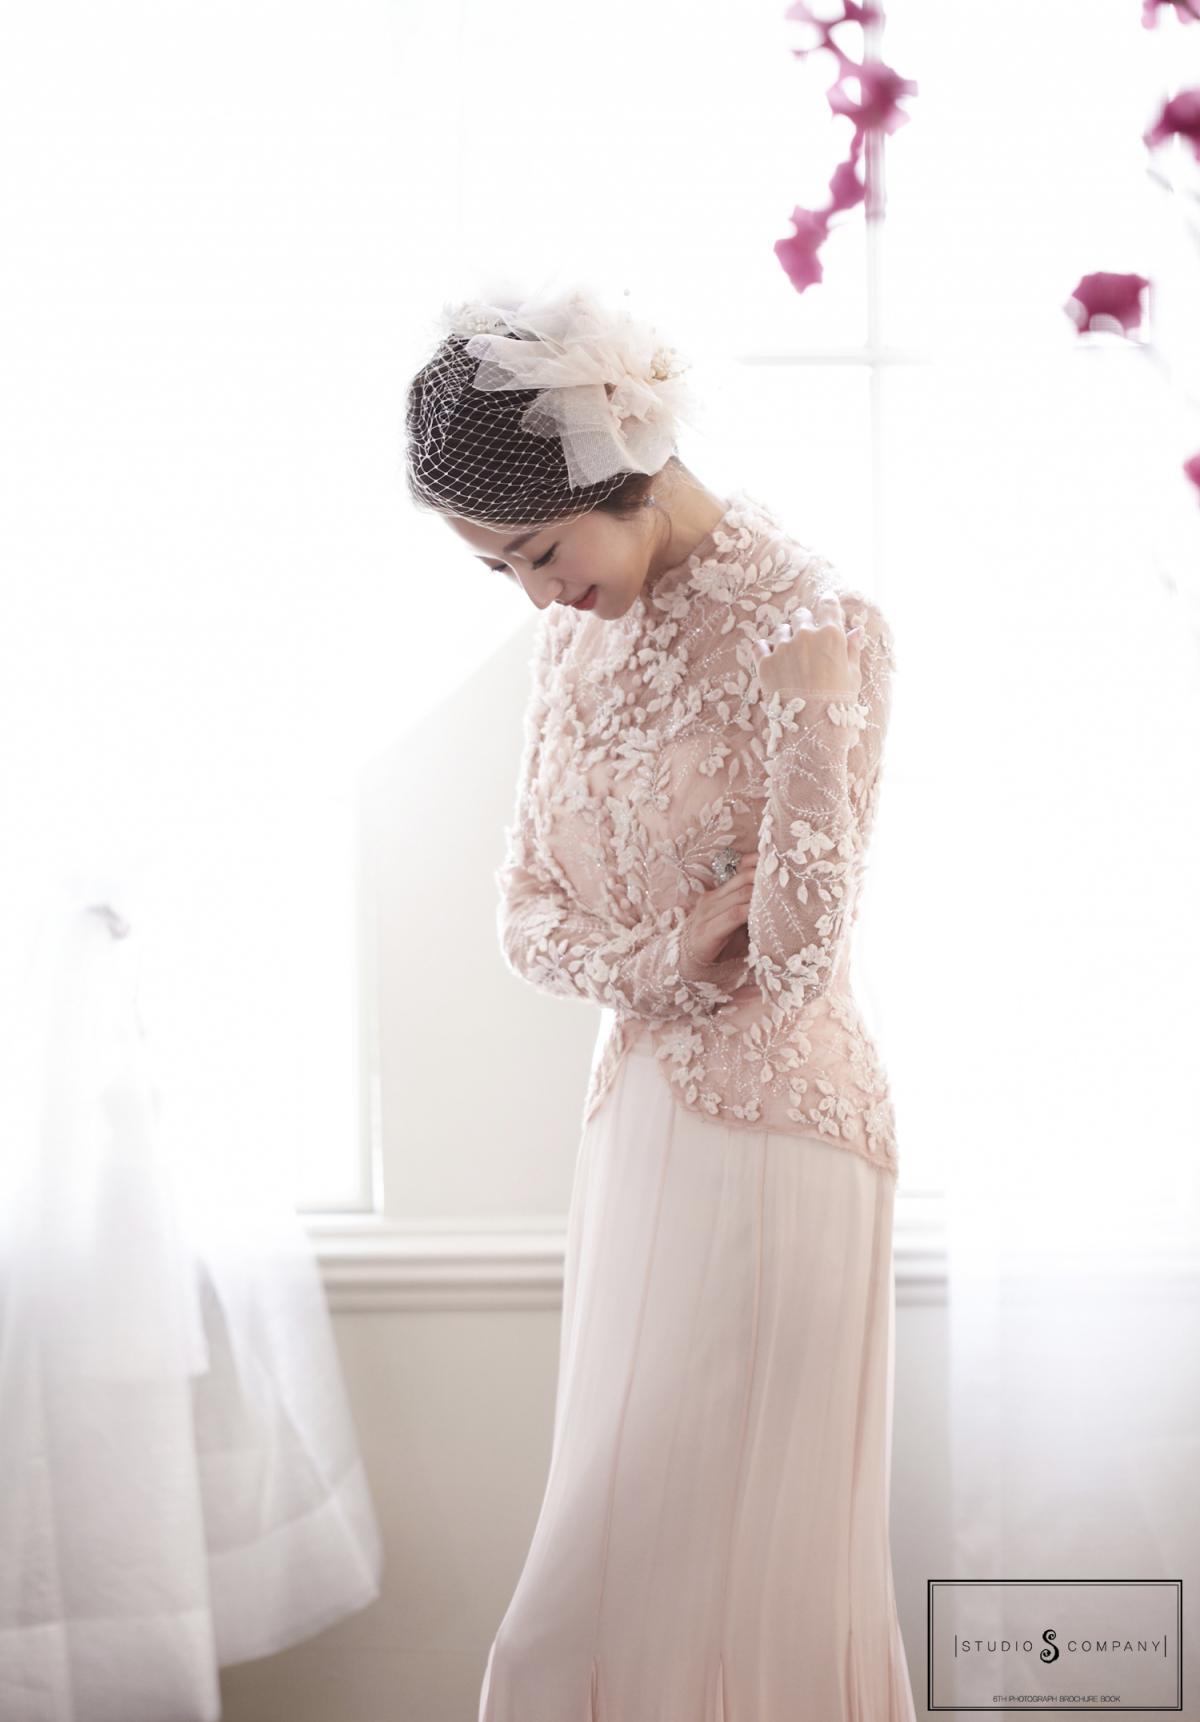 S studio 婚纱摄影_韩国韩流_韩游网